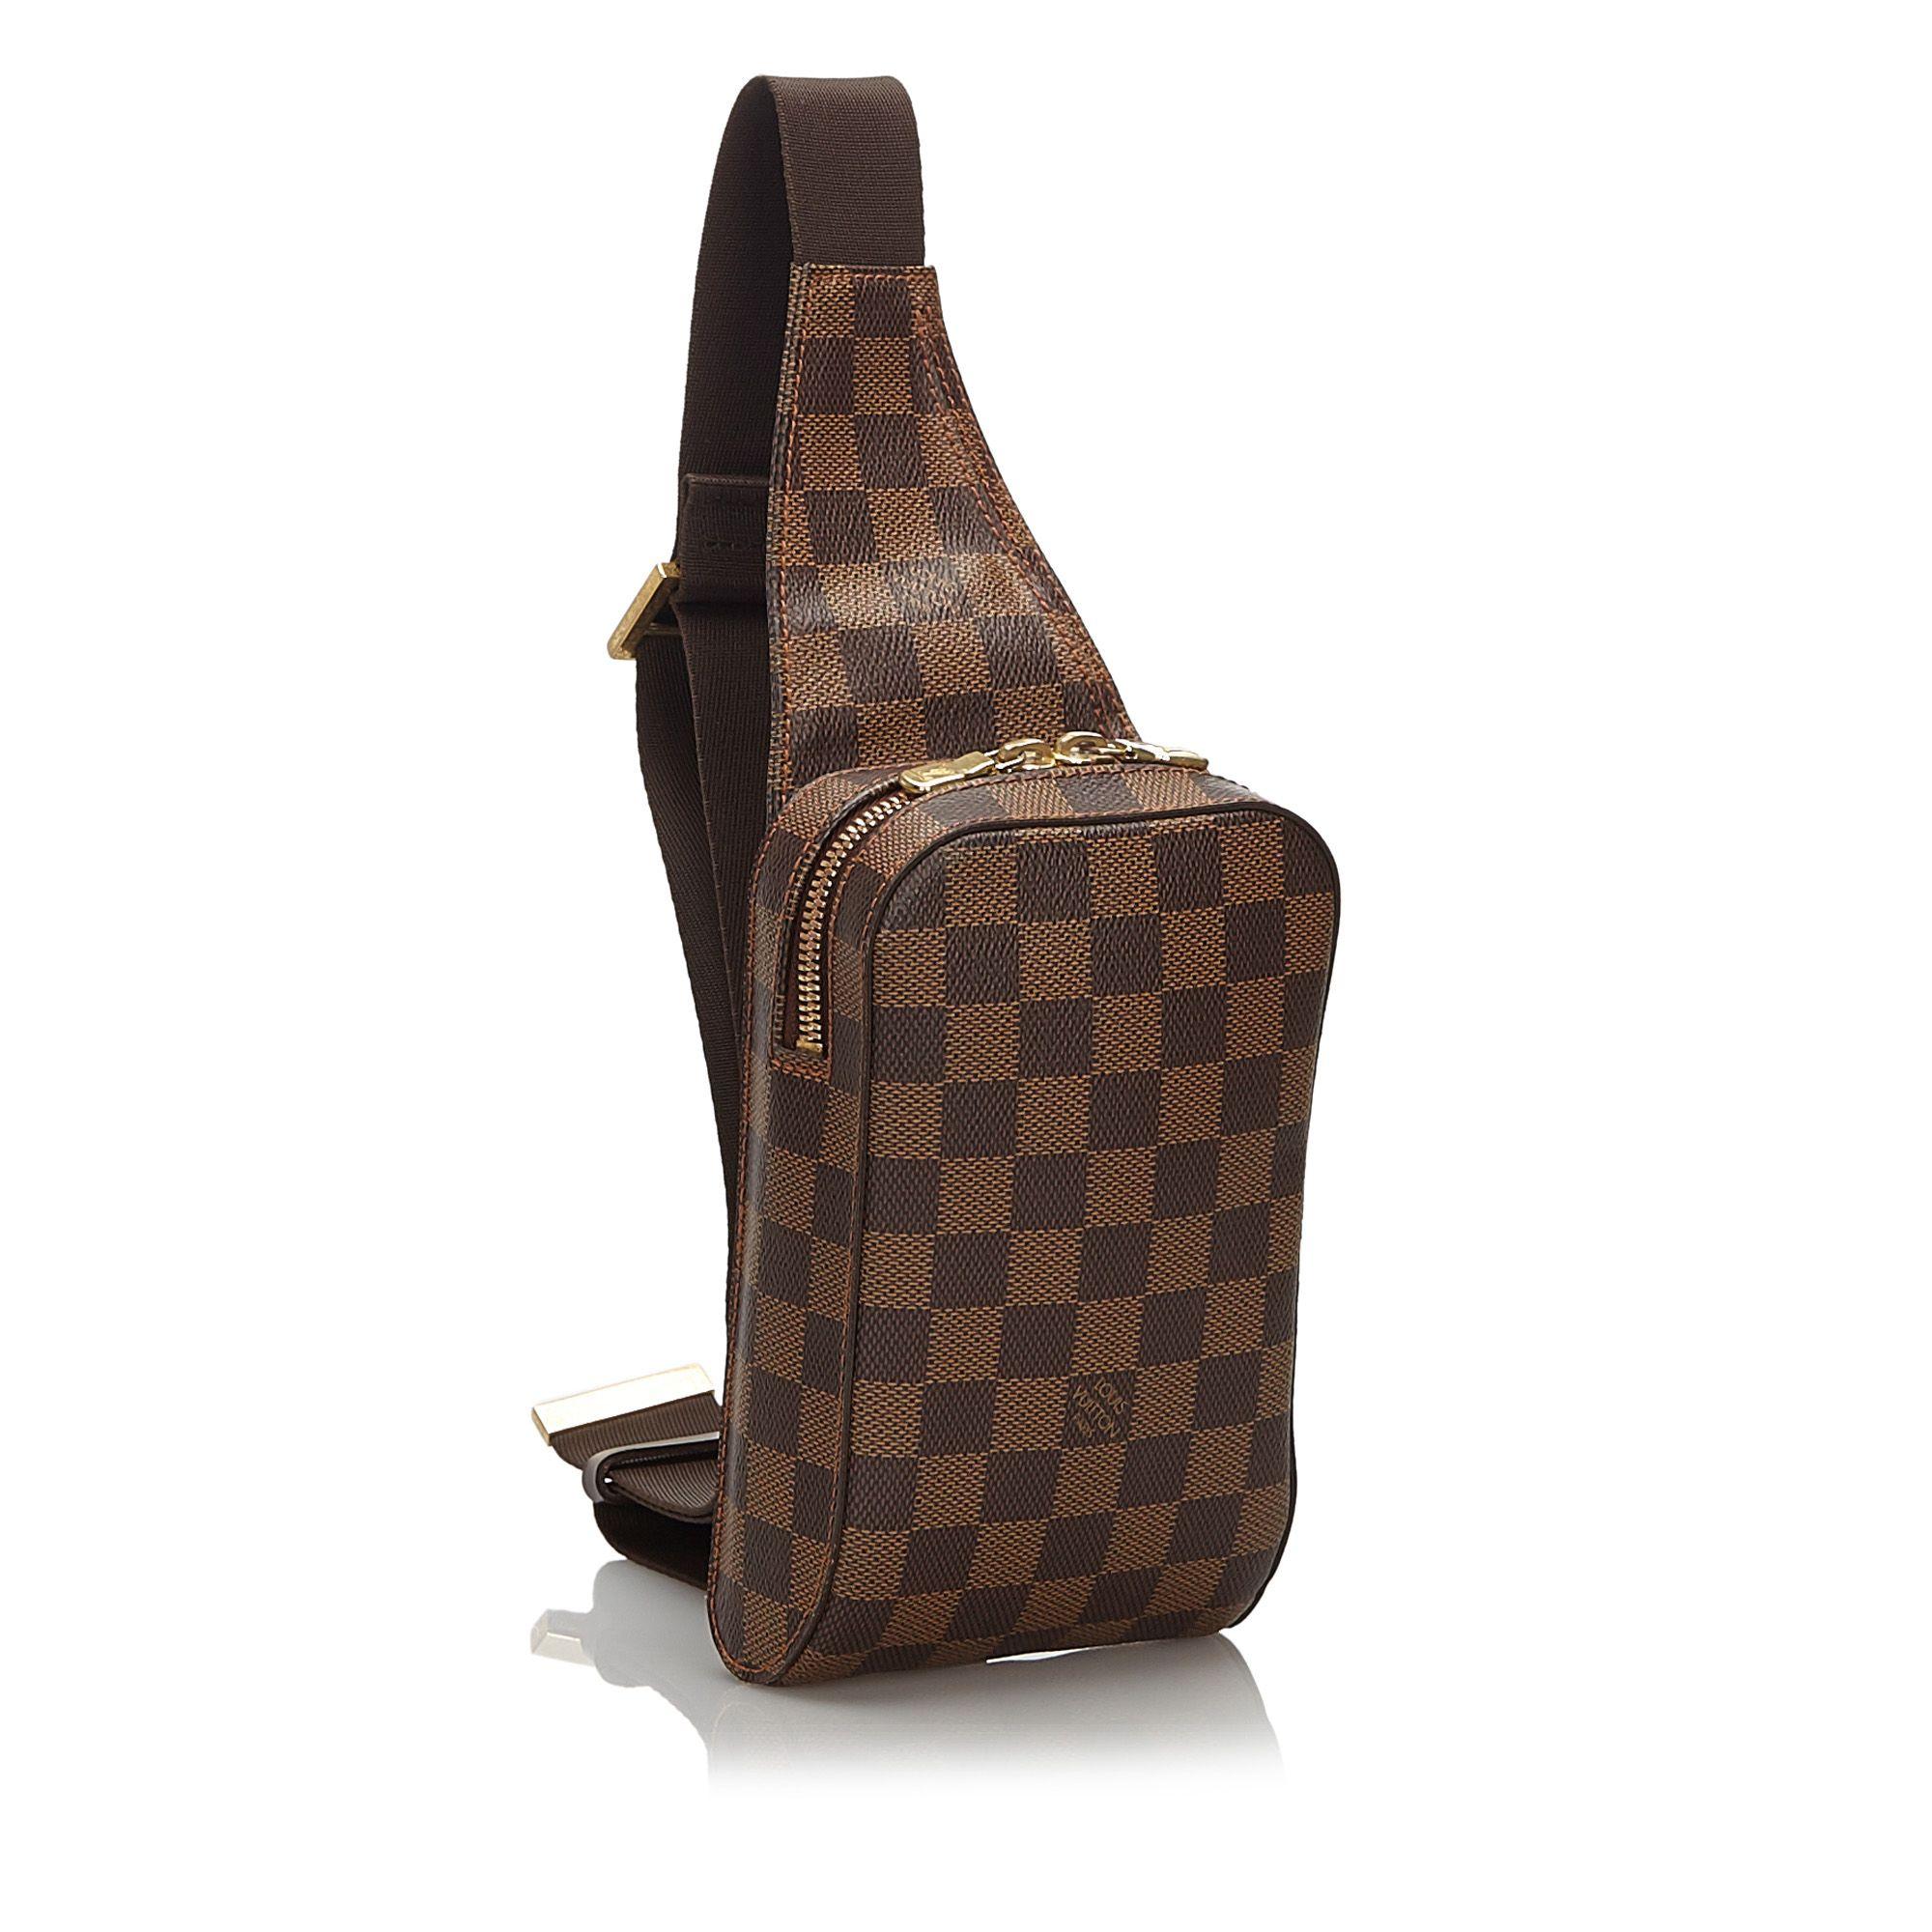 Vintage Louis Vuitton Damier Ebene Geronimos Brown